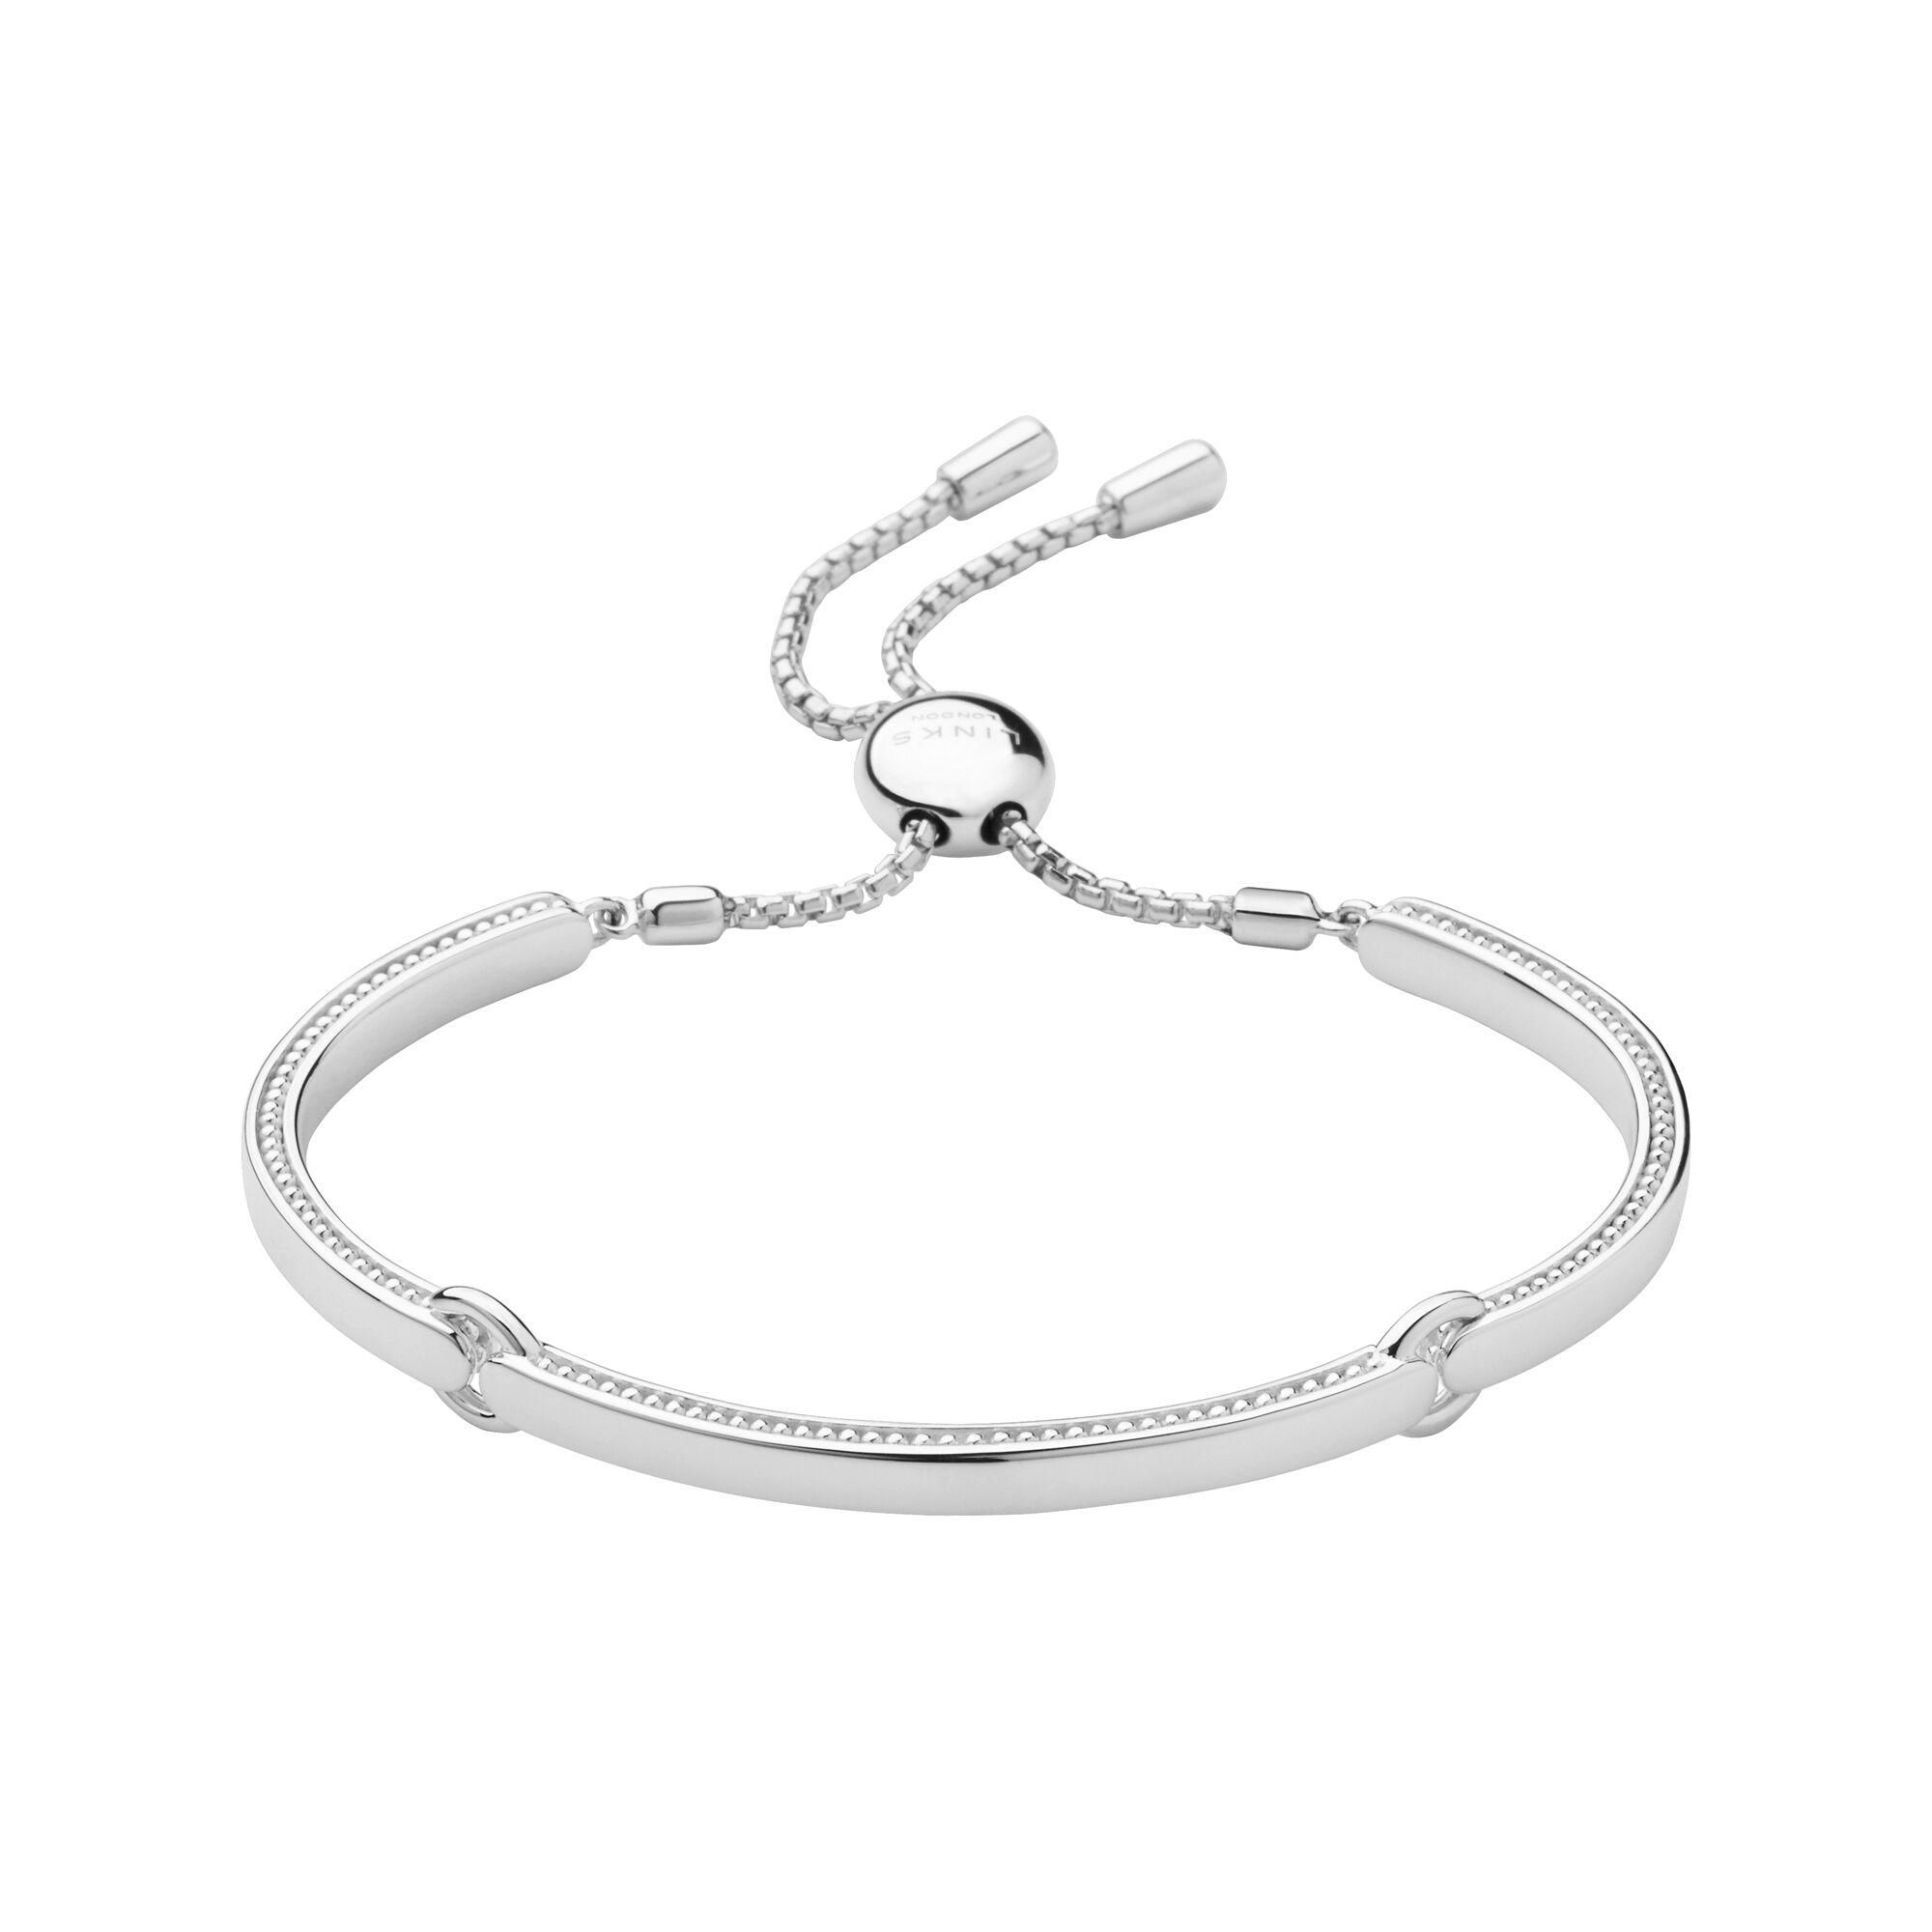 Narrative Collection Silver Bracelet Links Of London